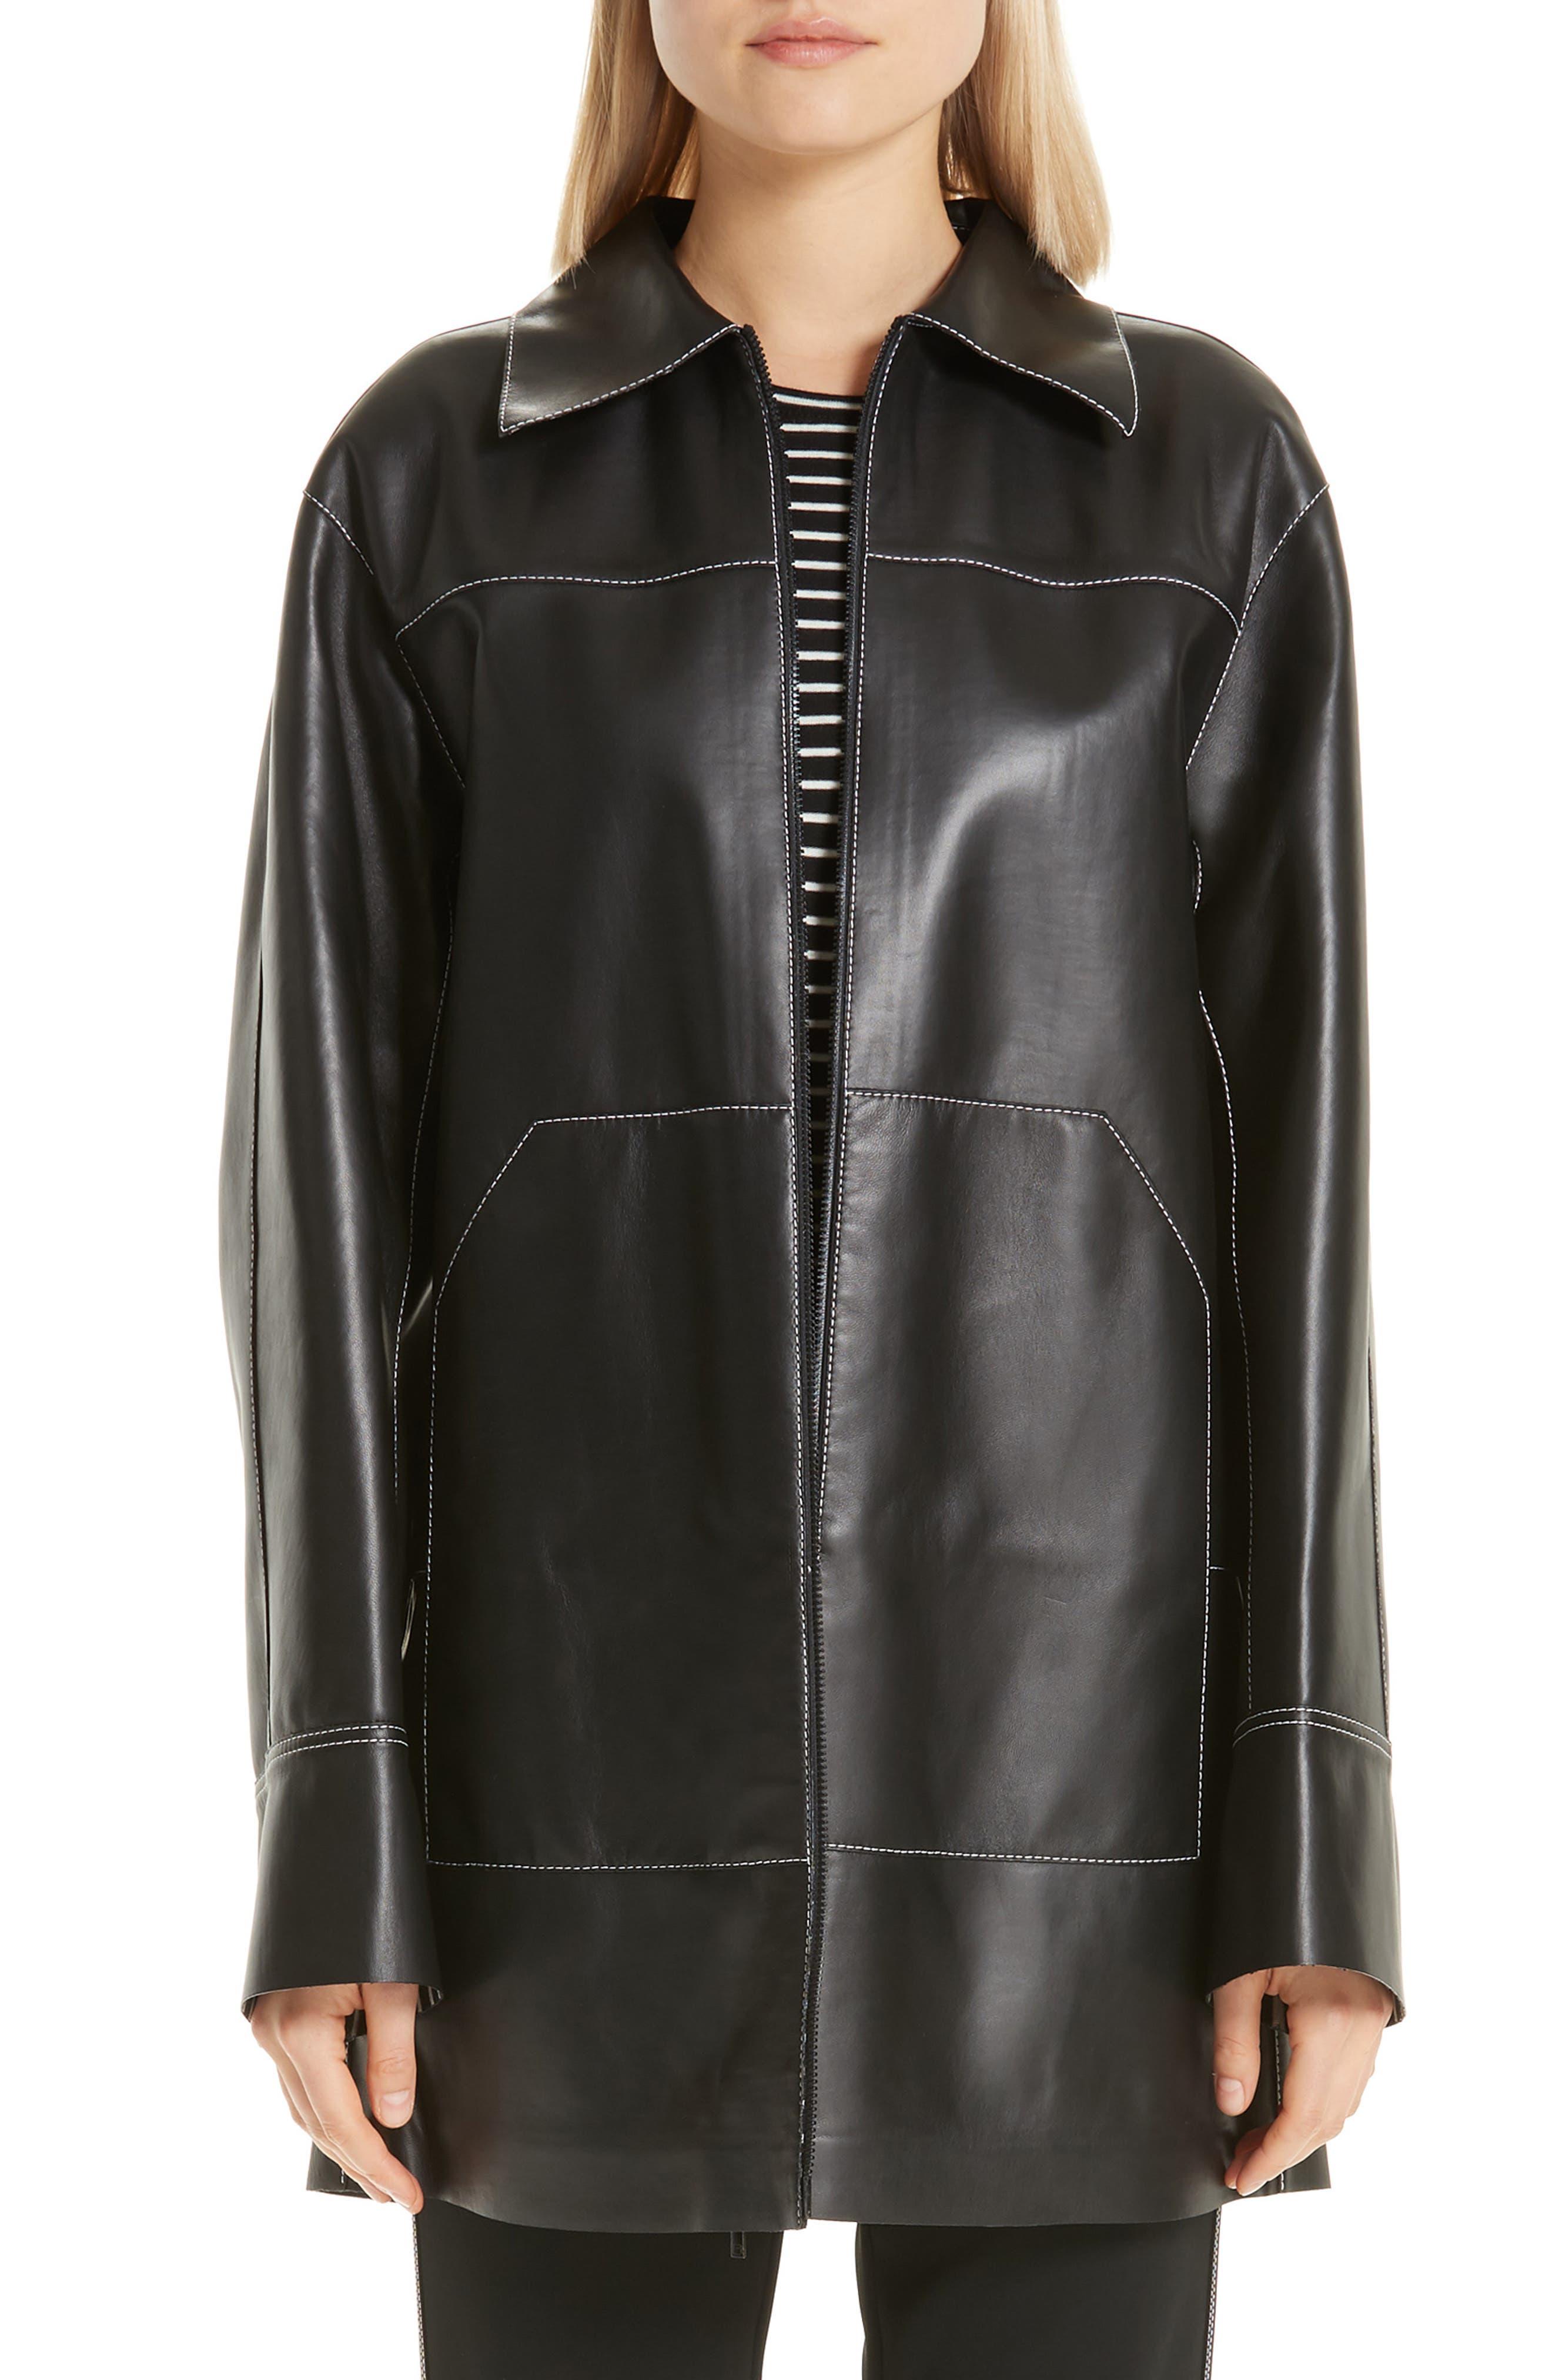 Christopher Leather Jacket,                             Main thumbnail 1, color,                             BLACK